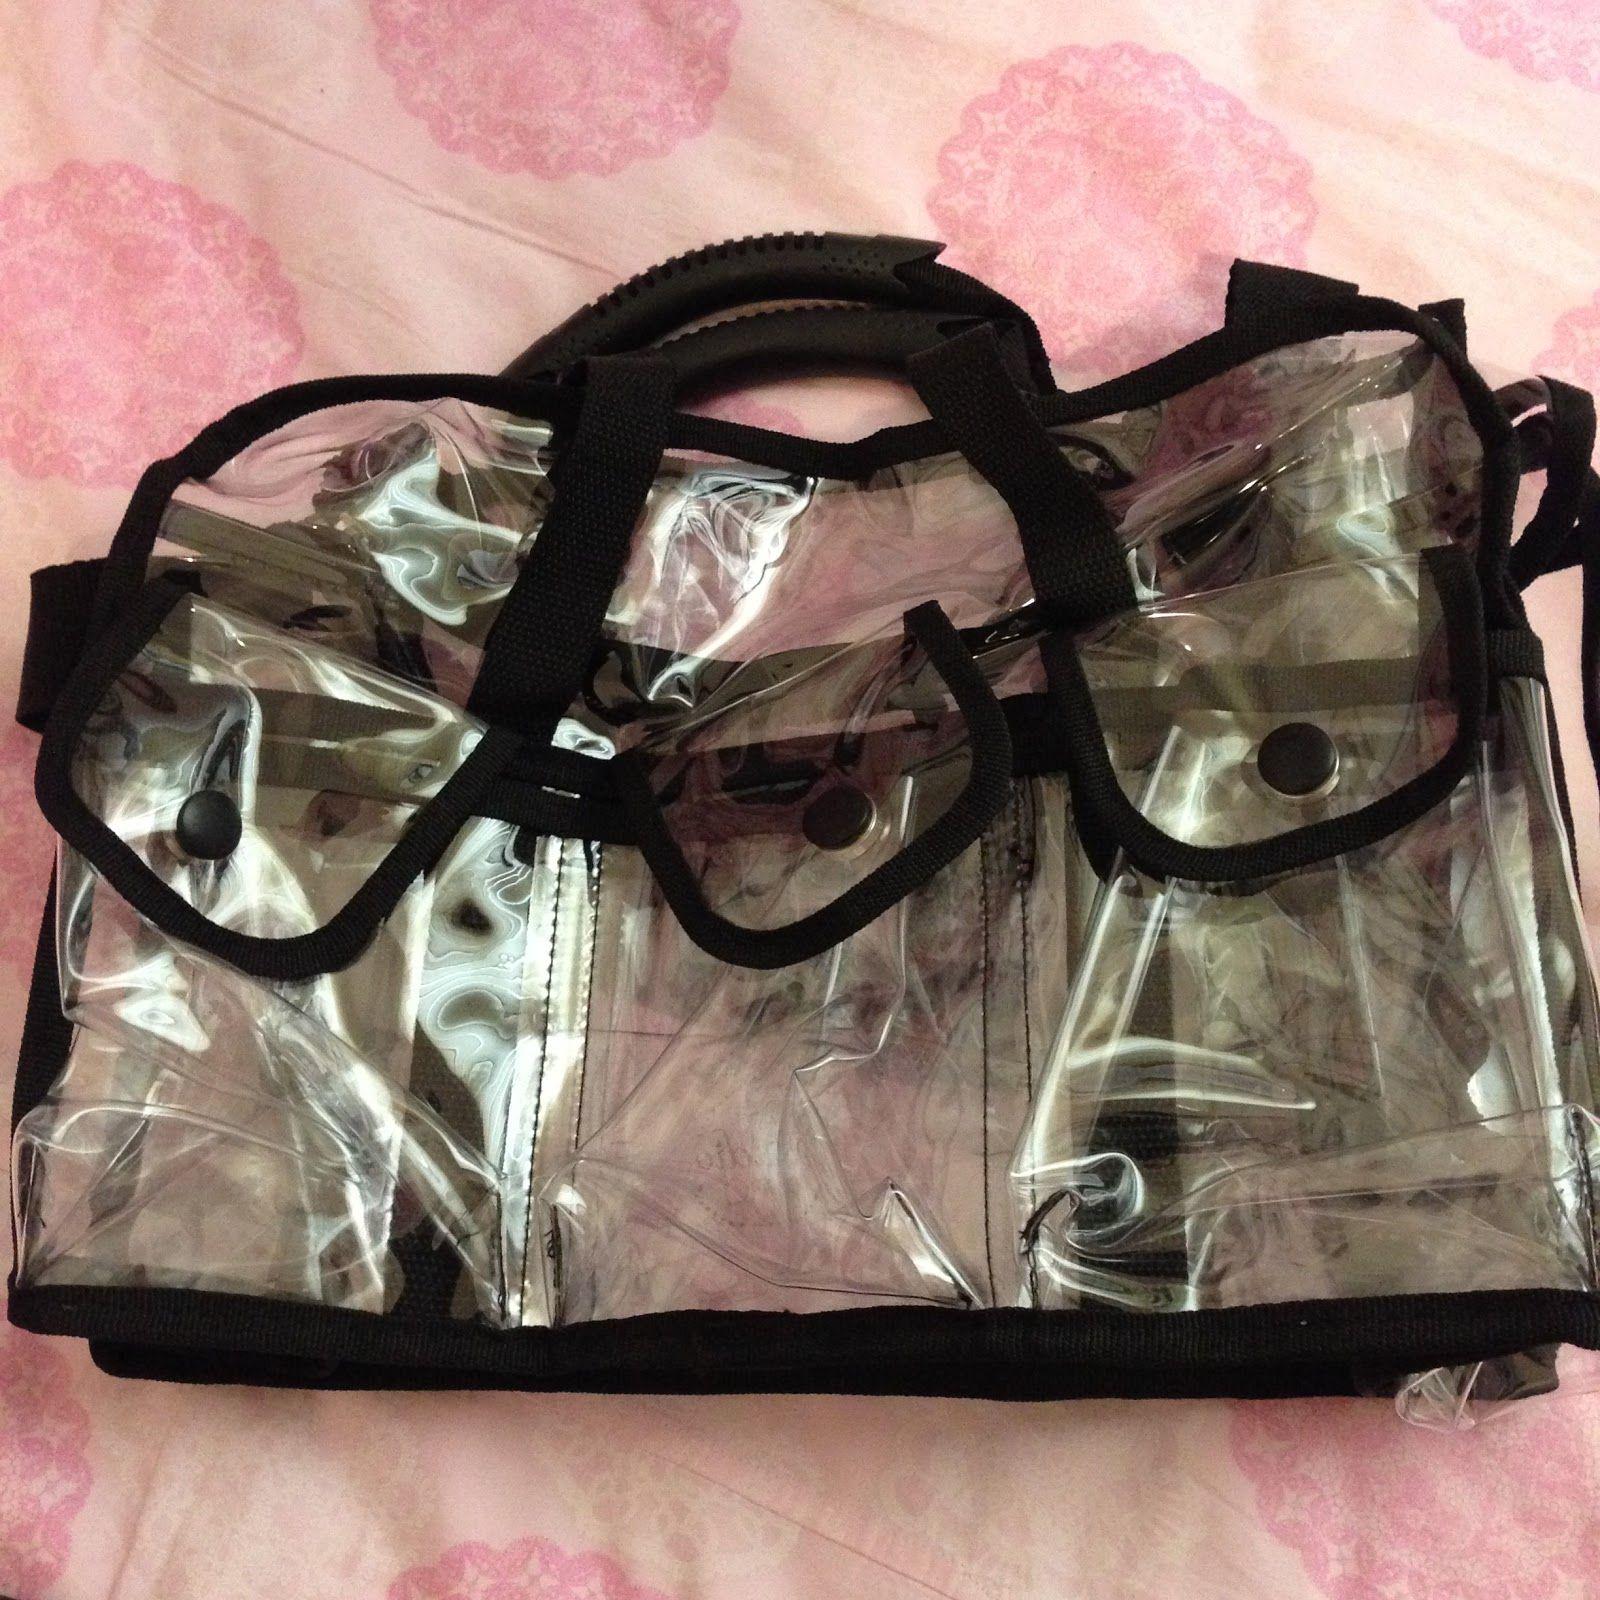 Makeup Bag By Bh Cosmetics